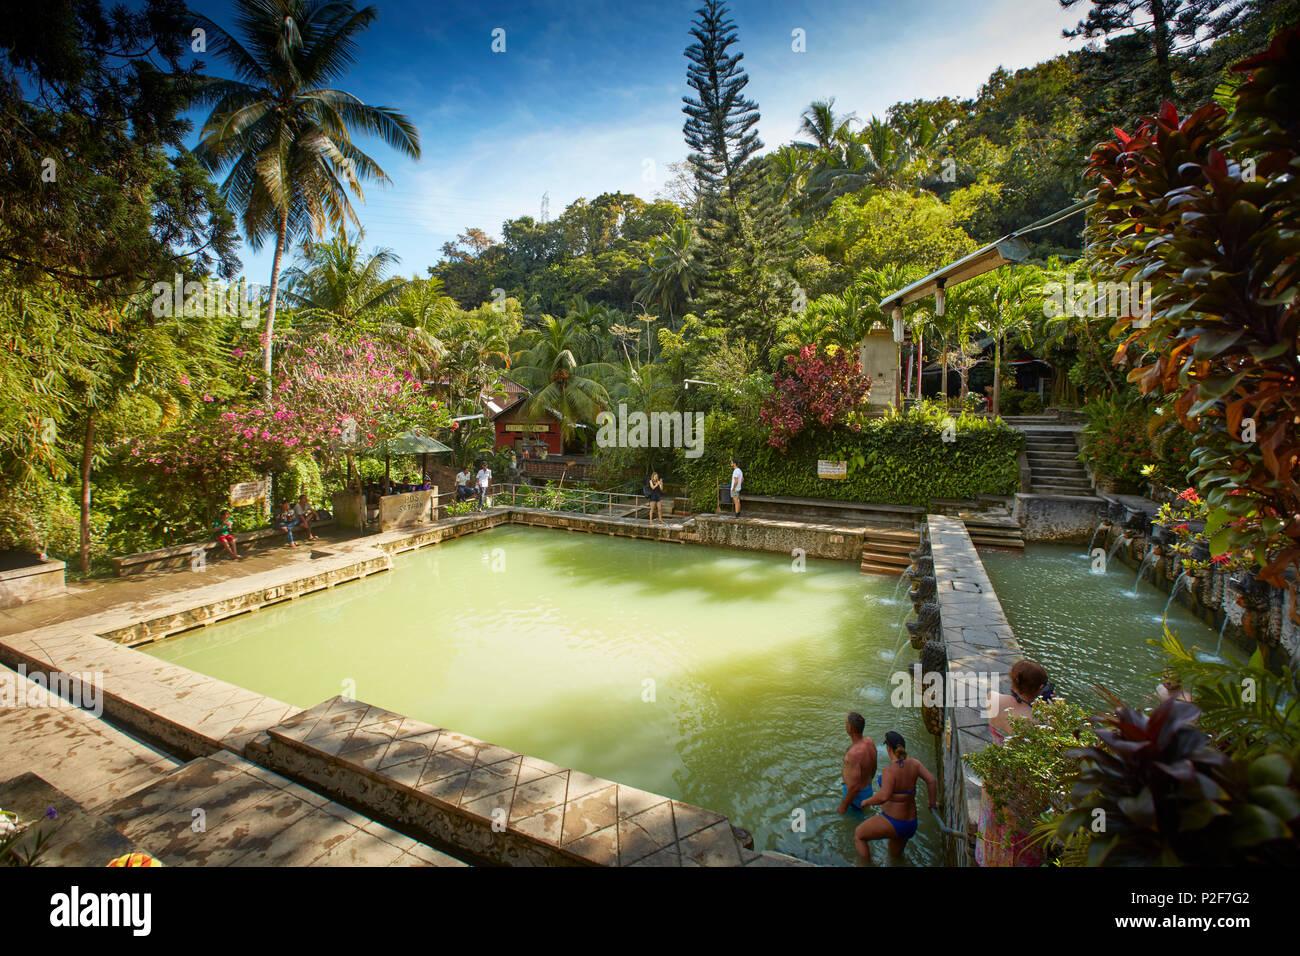 Pool, Hot Springs Air Panas Banjar at Bubunan, Bali, Indonesia Stock Photo